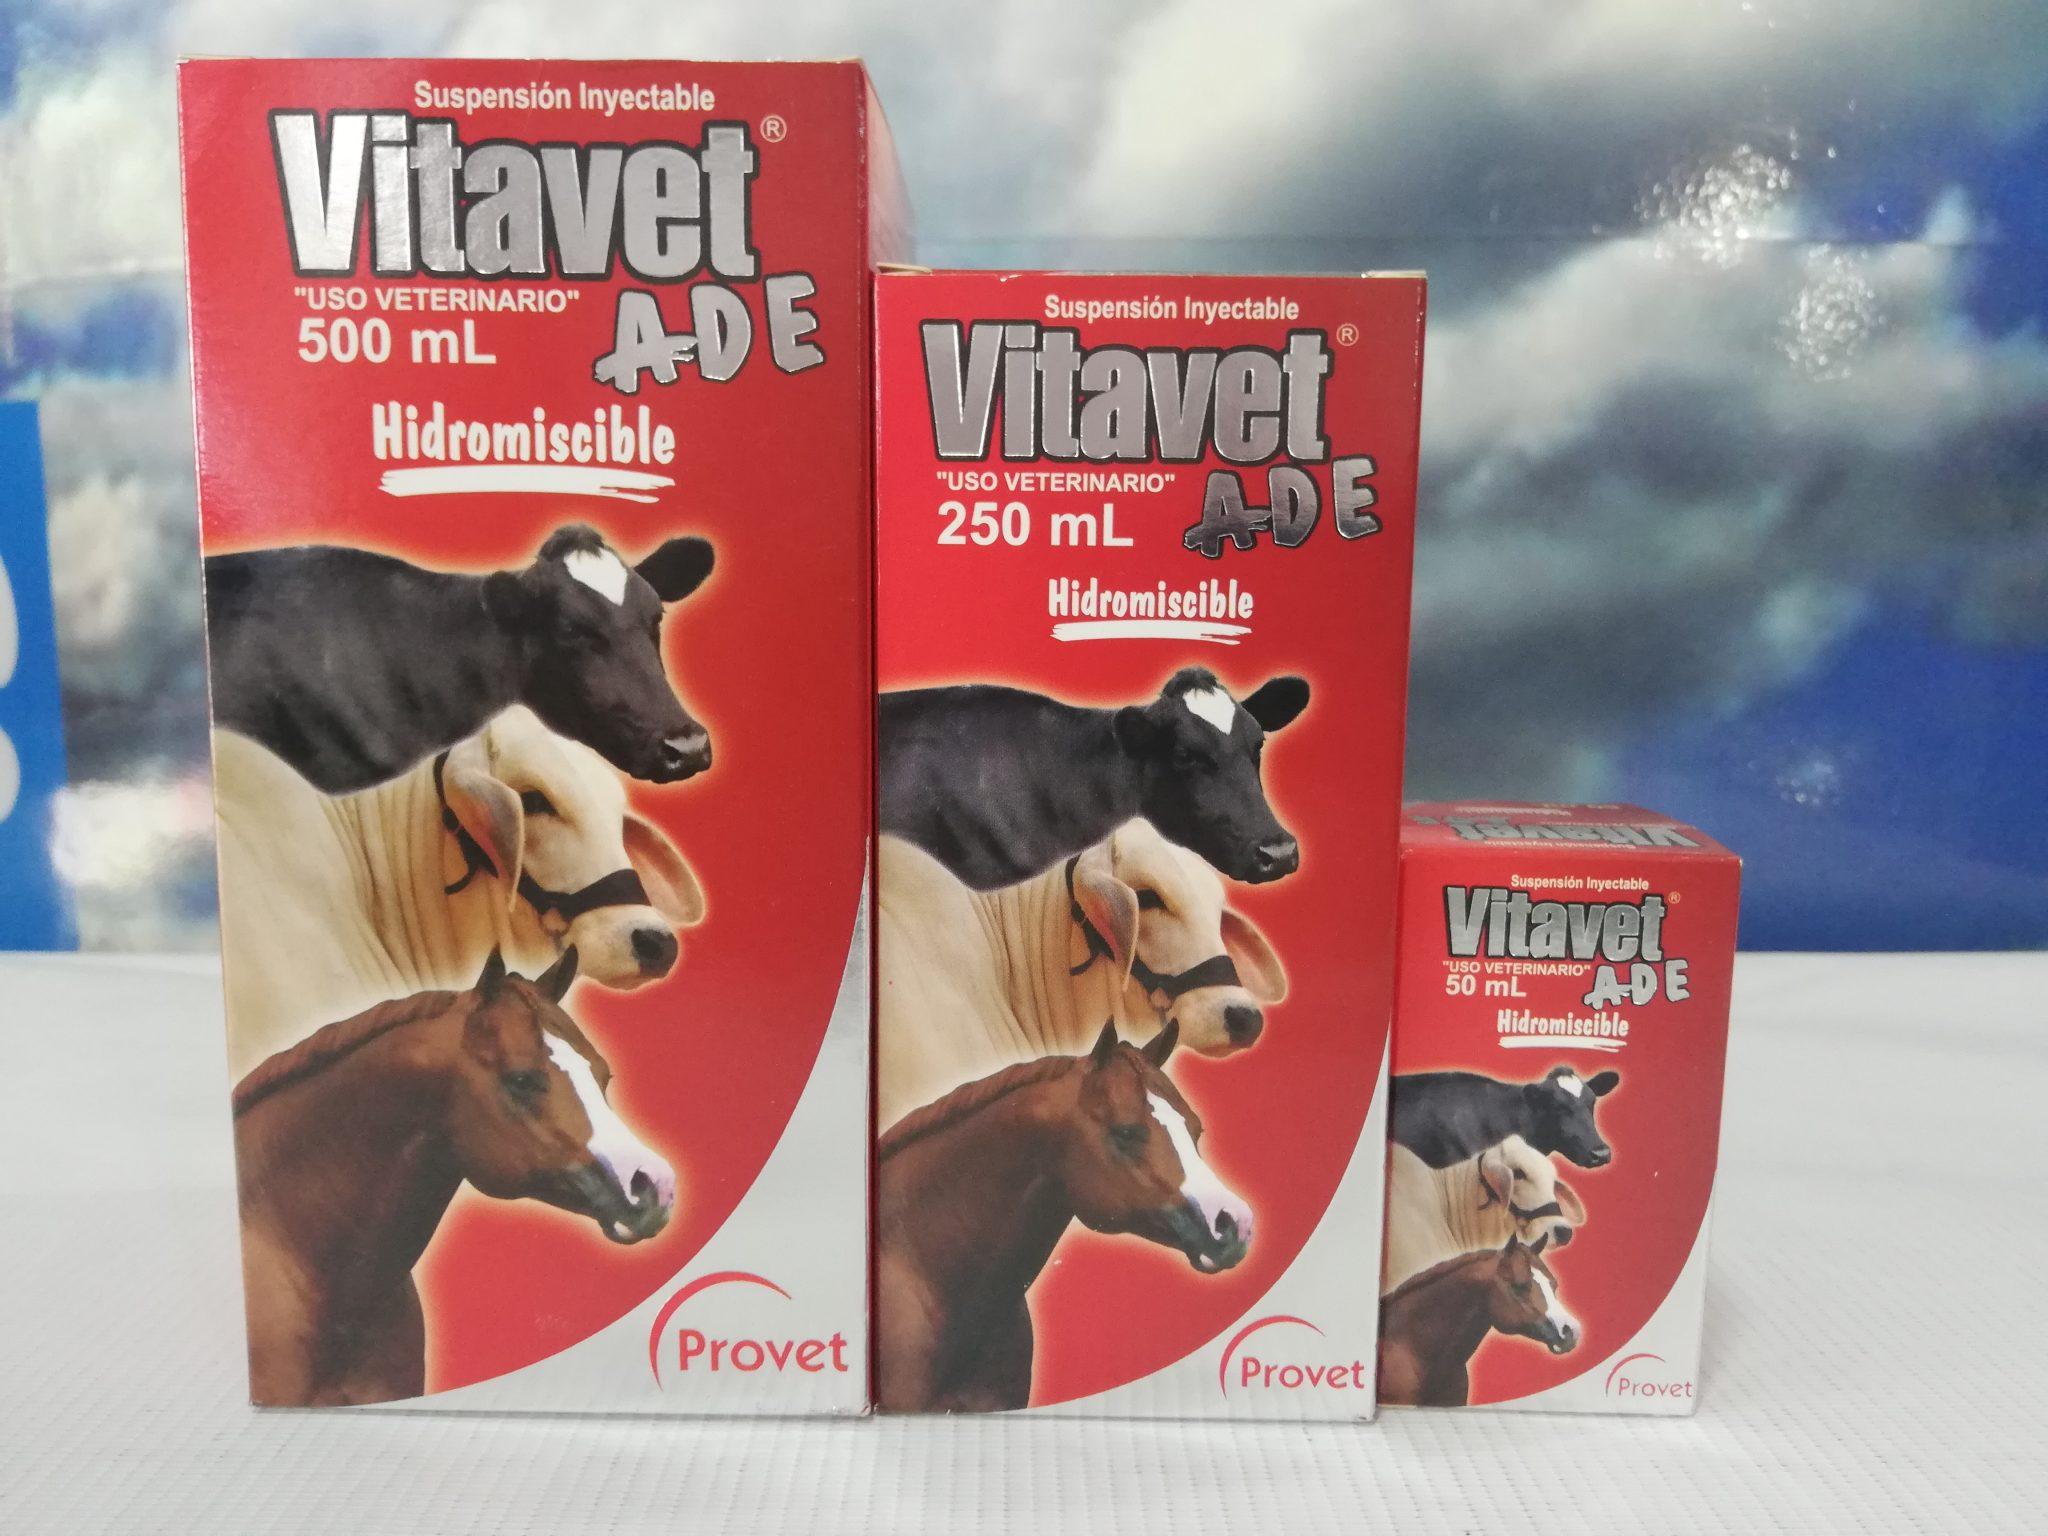 VITAVET ADE X 500 ML PROVET